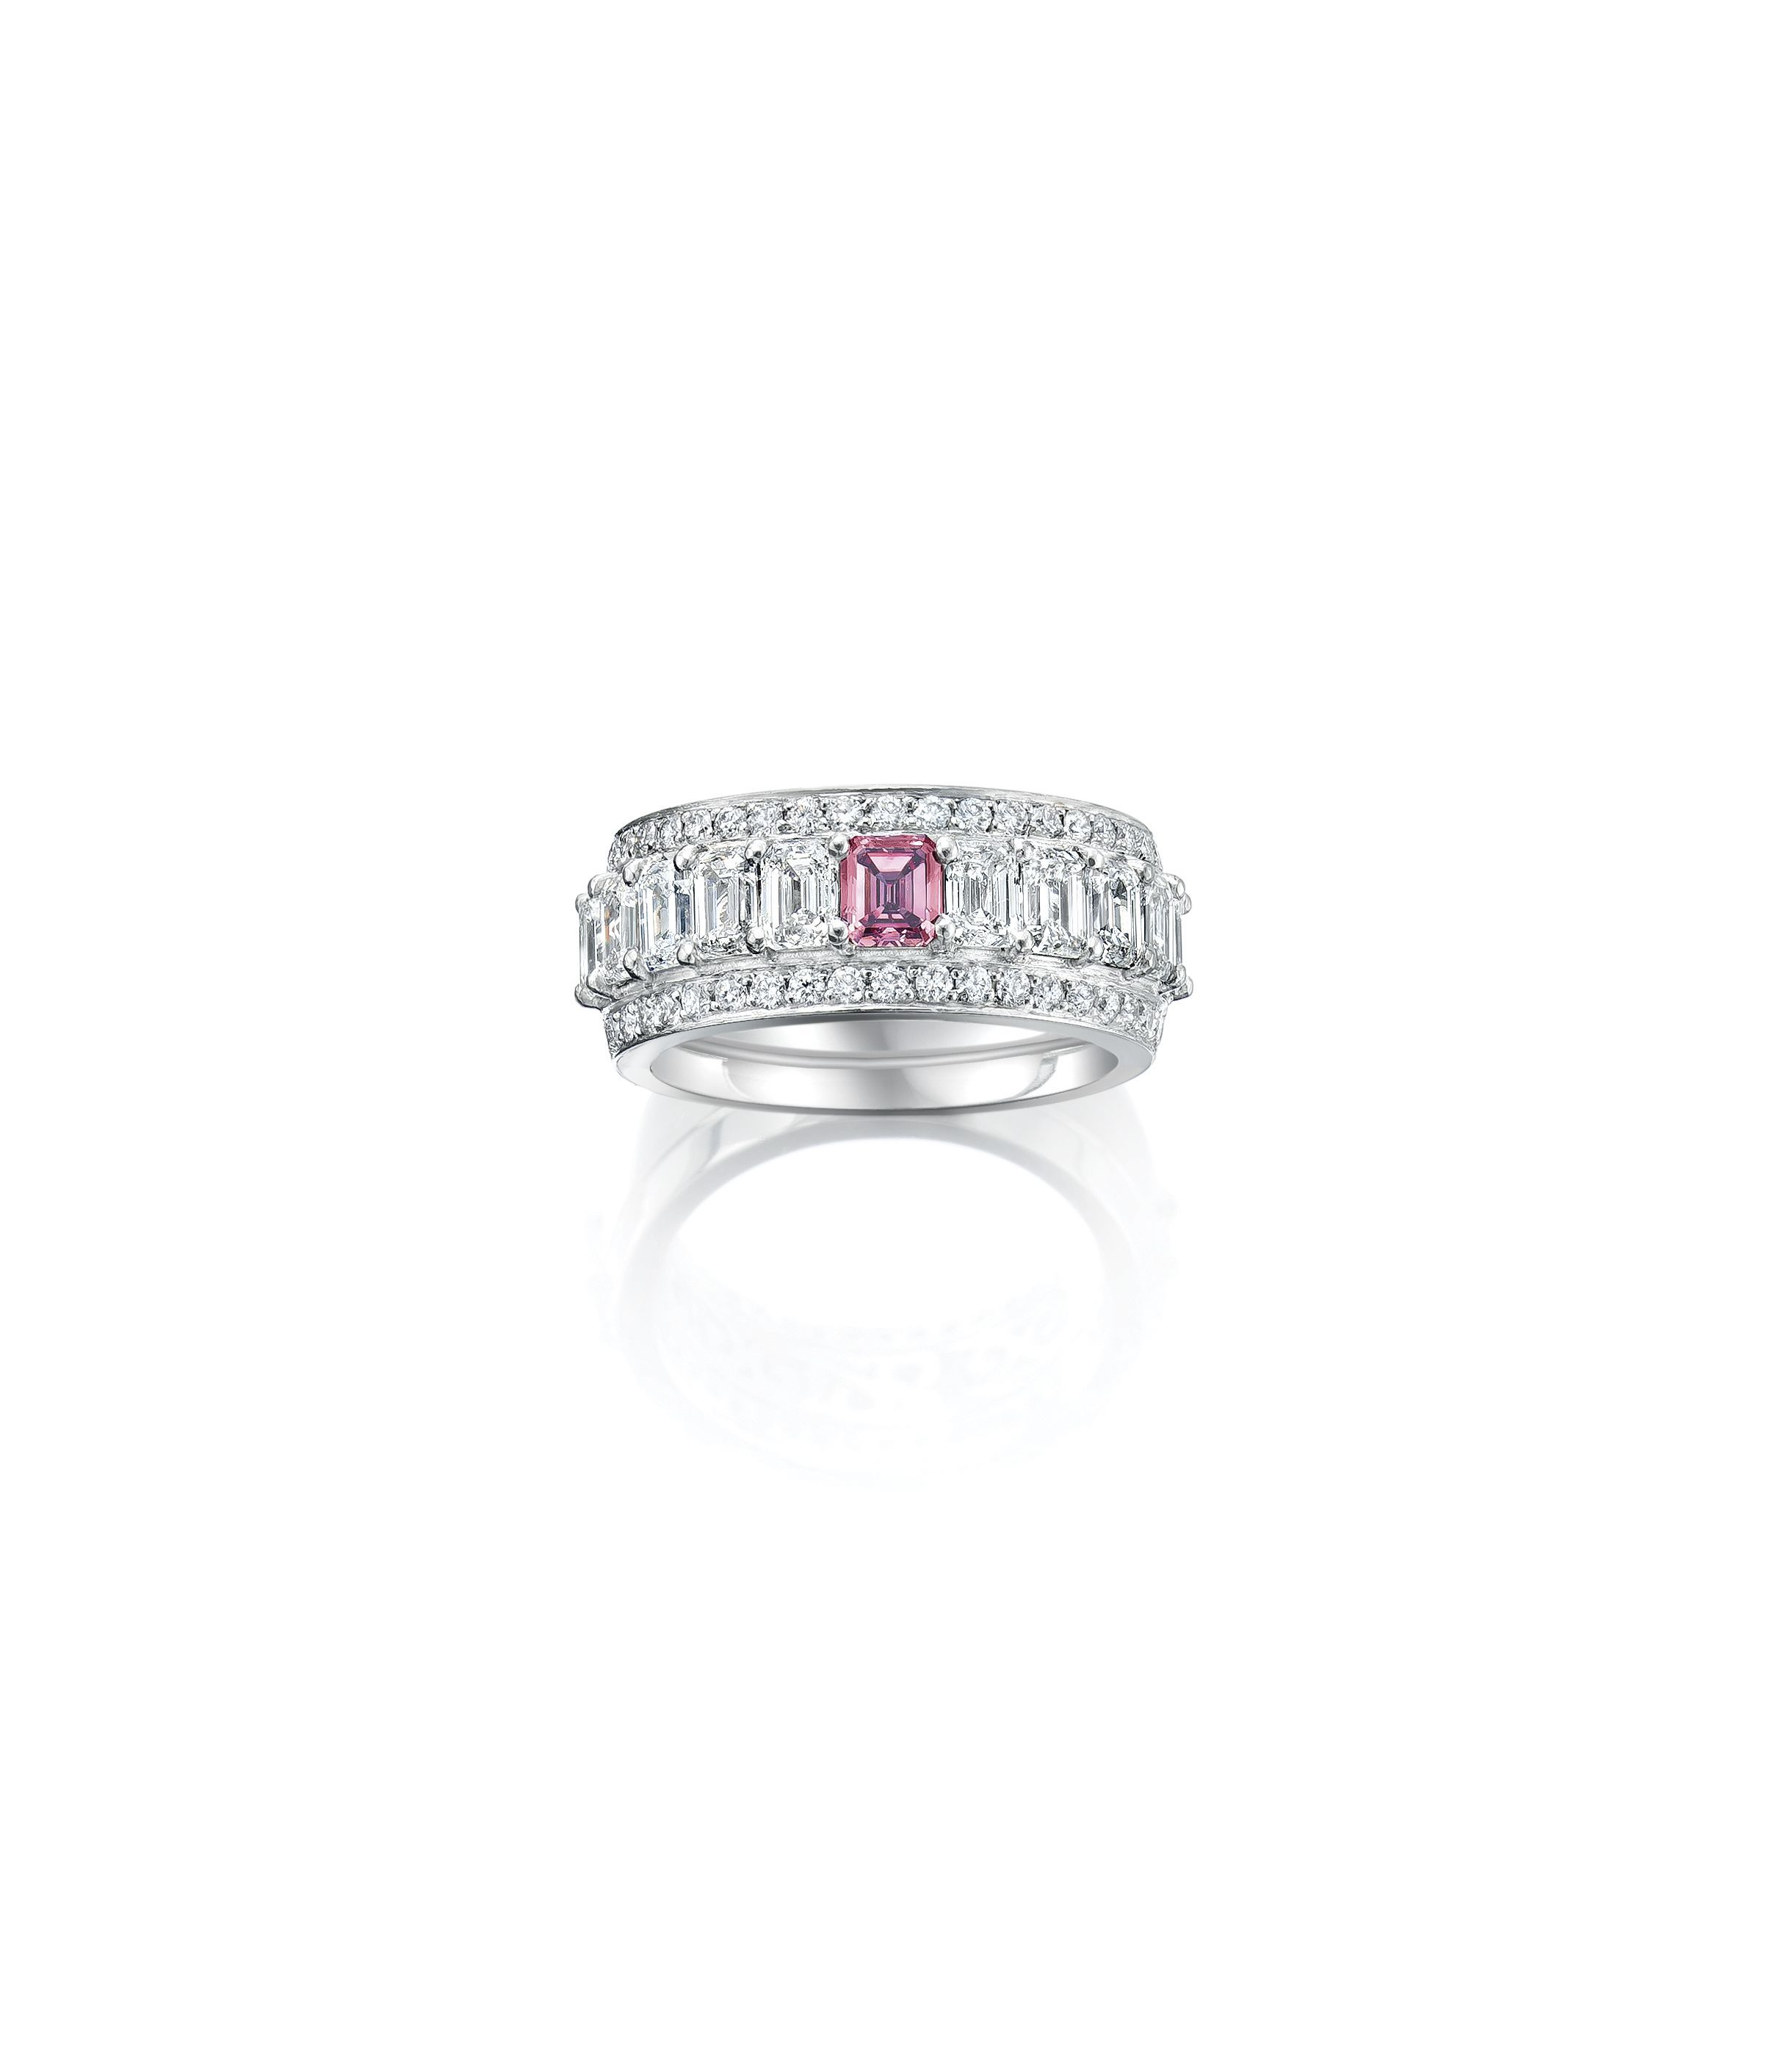 An Australian Argyle Pink Diamond Features In This Stunning Dress